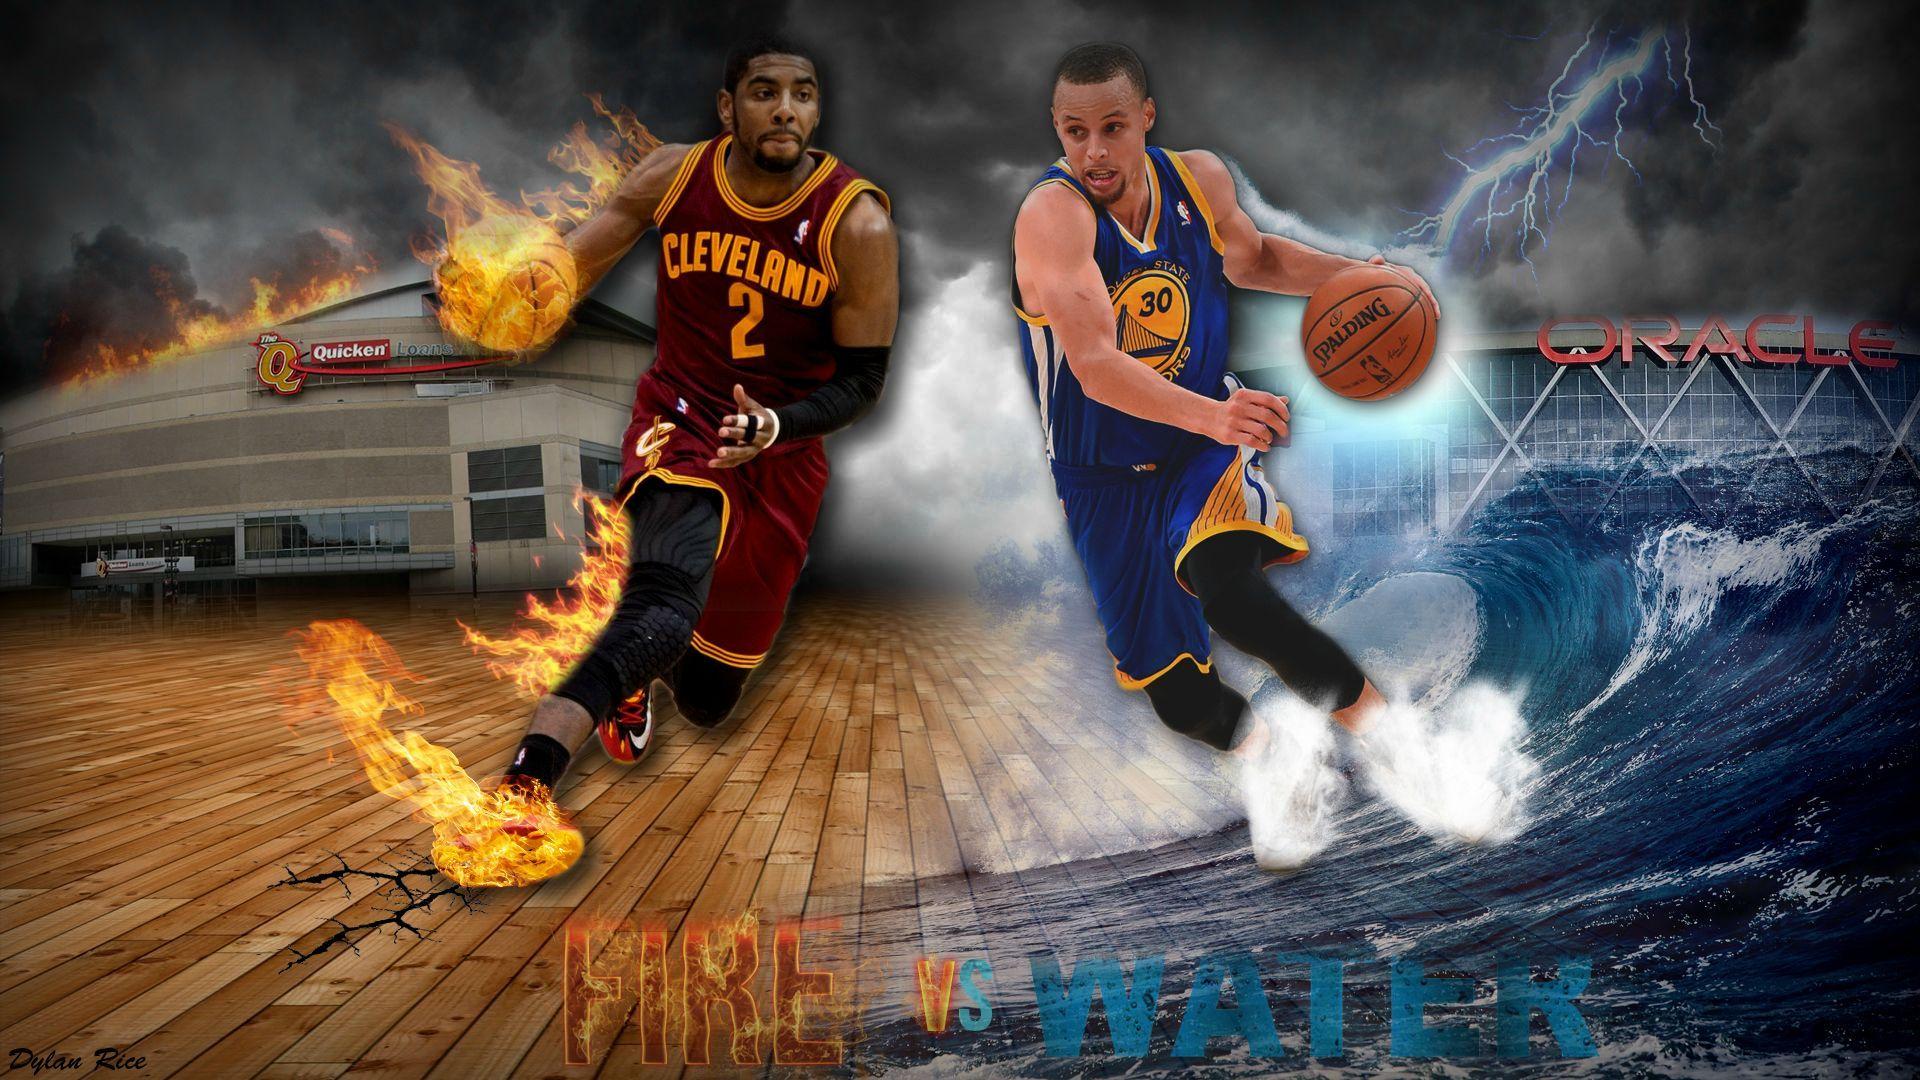 Fire Vs Water Stephen Curry Wallpaper Hd  Wallpaper